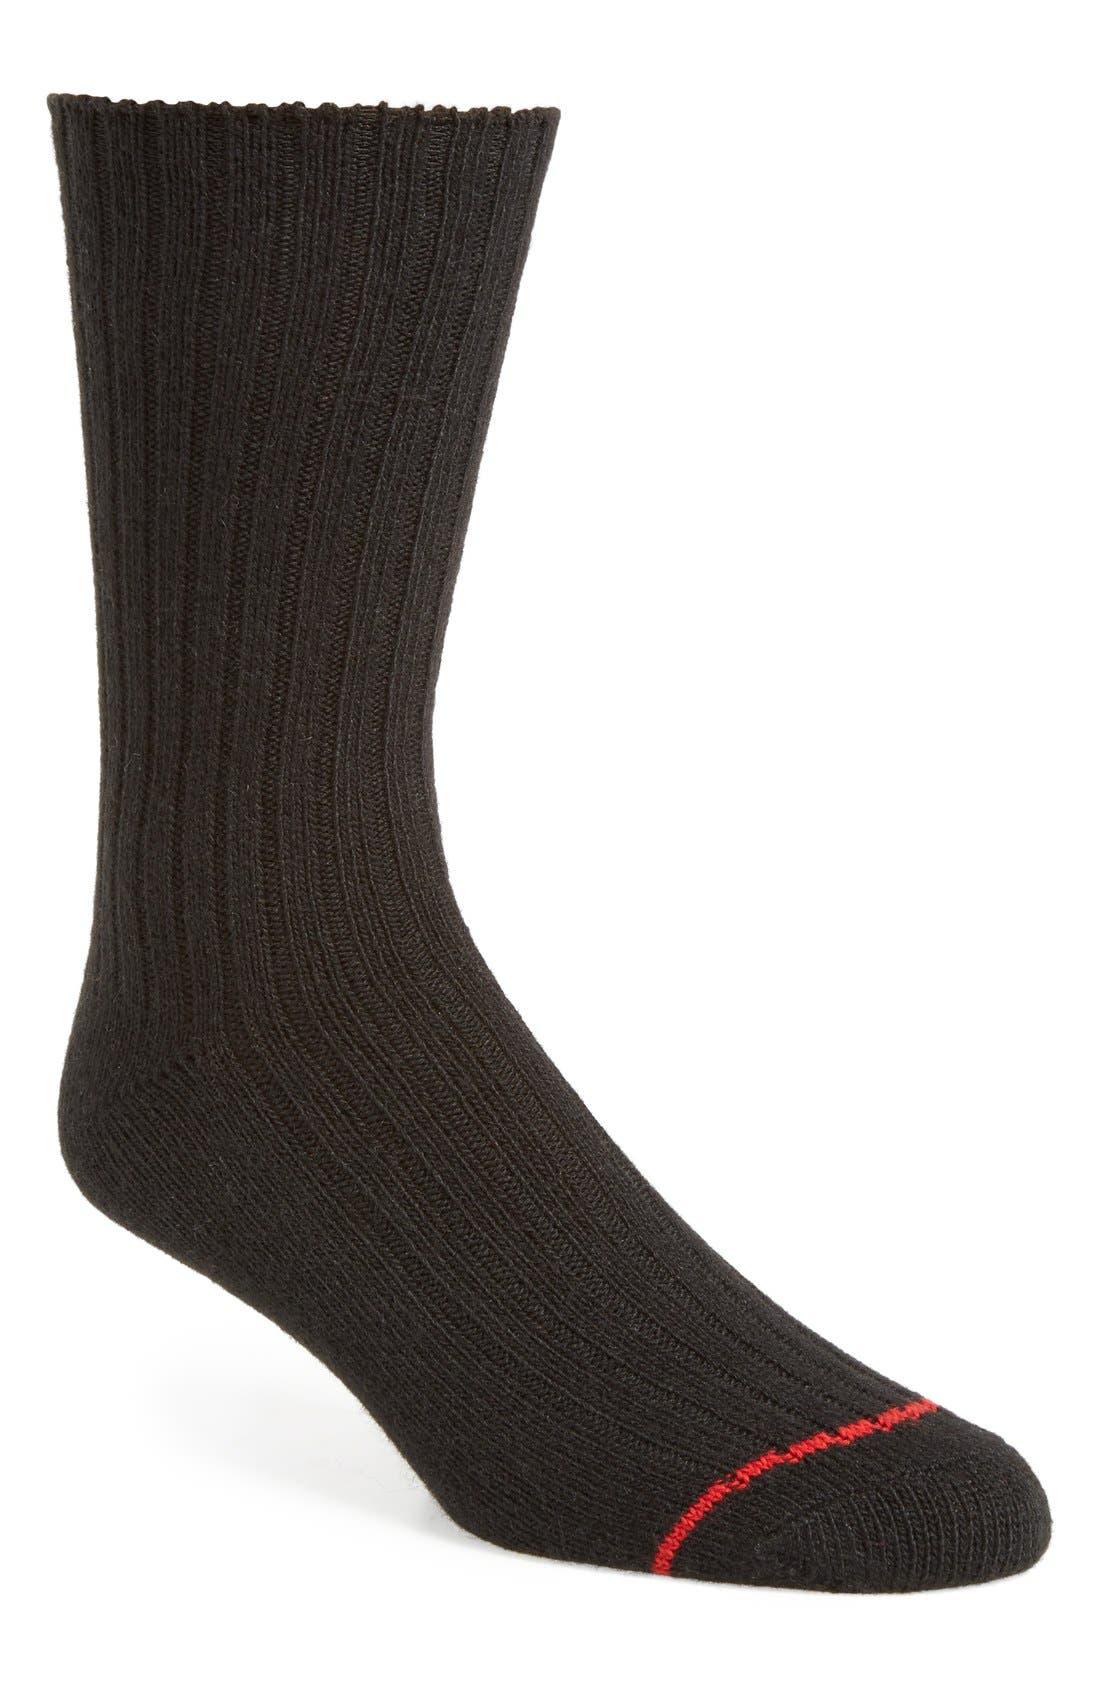 UGG 'Classic' Heathered Socks,                             Main thumbnail 1, color,                             001